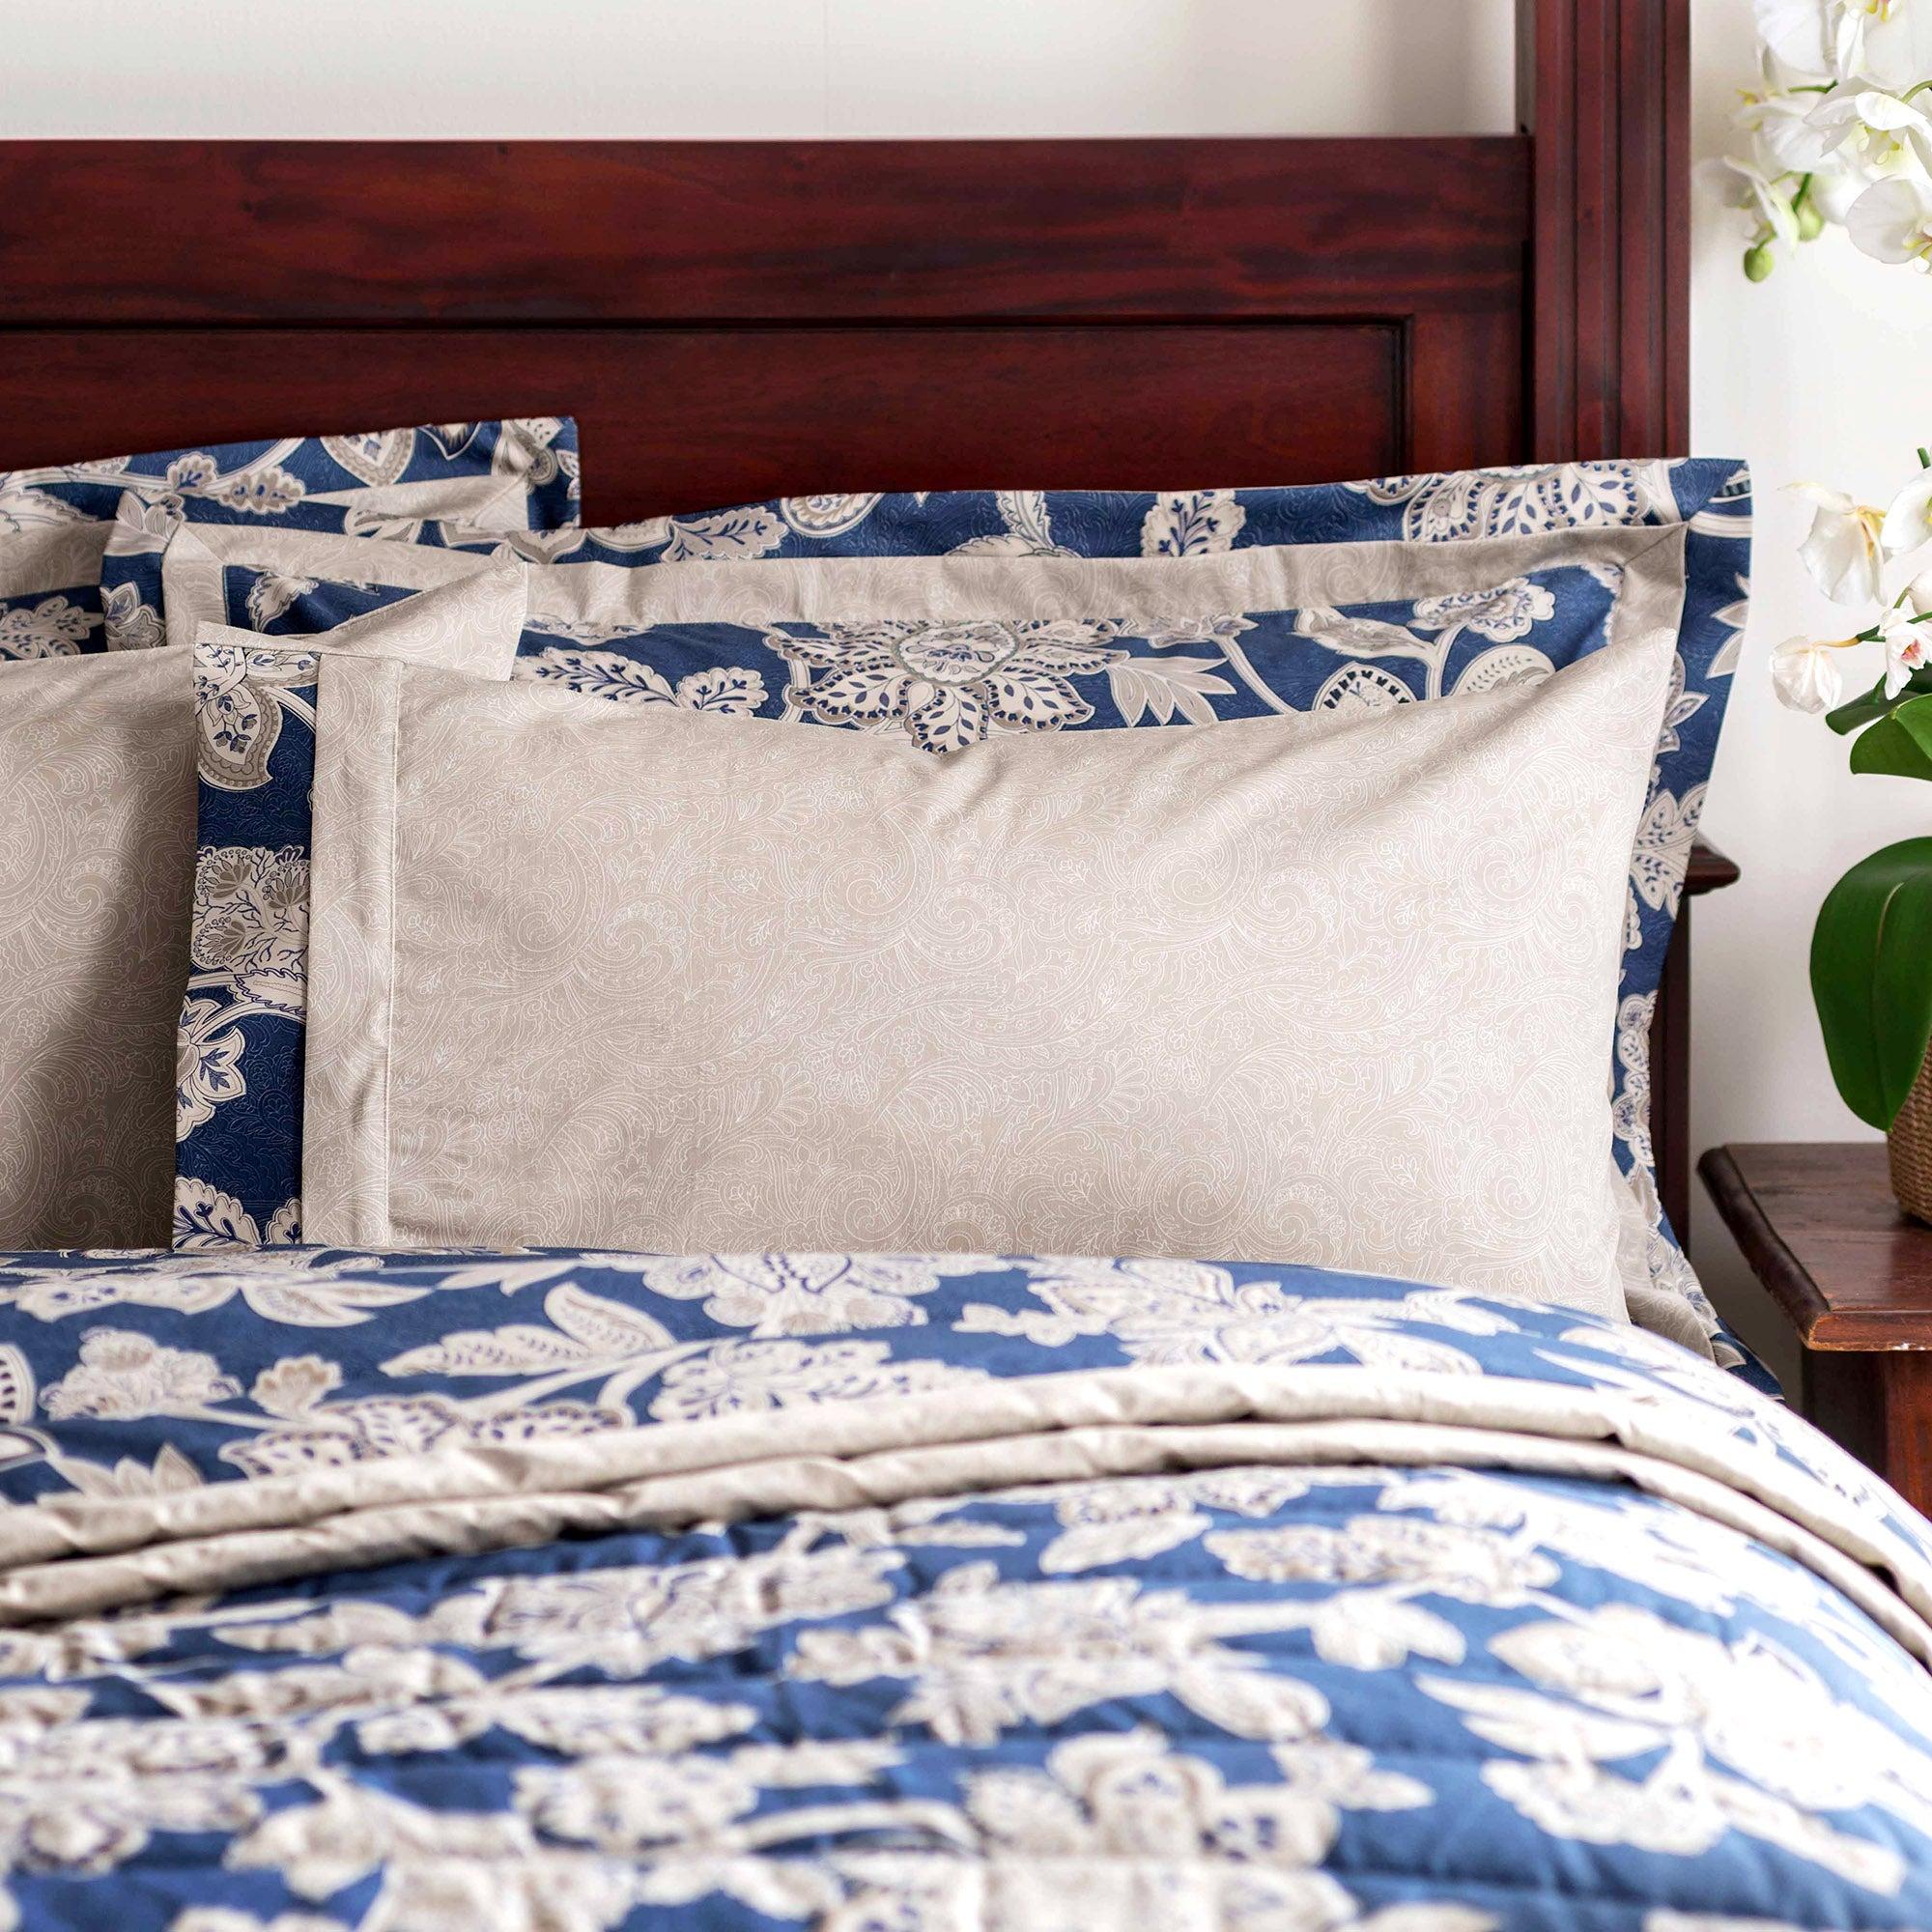 Dorma Blue Samira Collection Cuffed Pillowcase